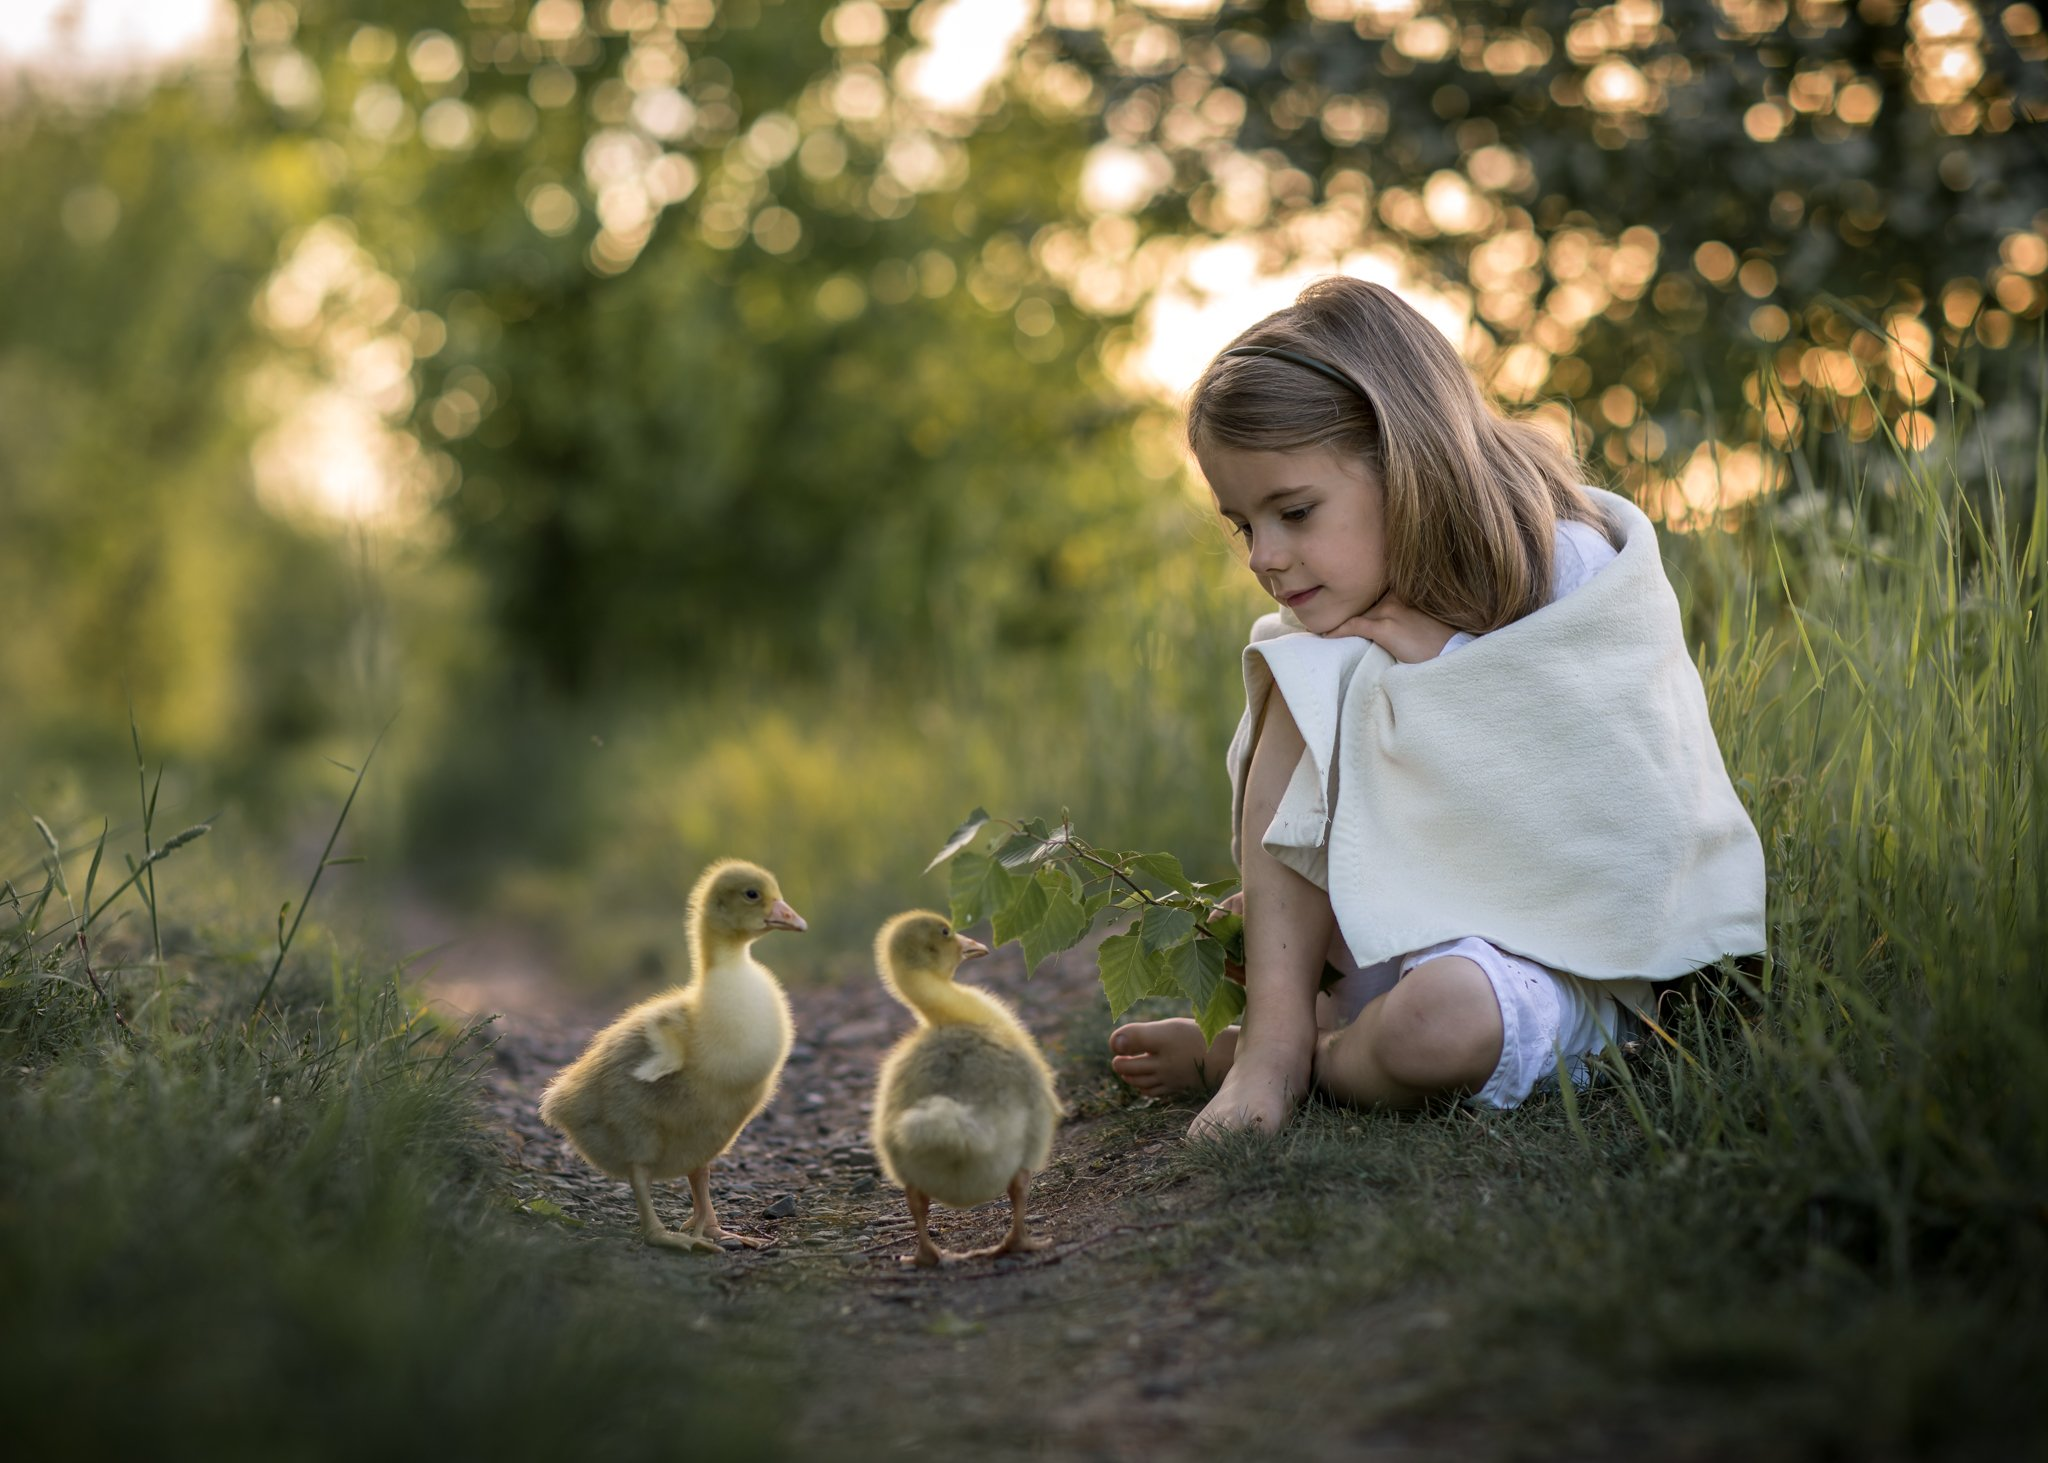 gooseherd goose little girl child cute bokeh dranikowski path magic childhood, Radoslaw Dranikowski